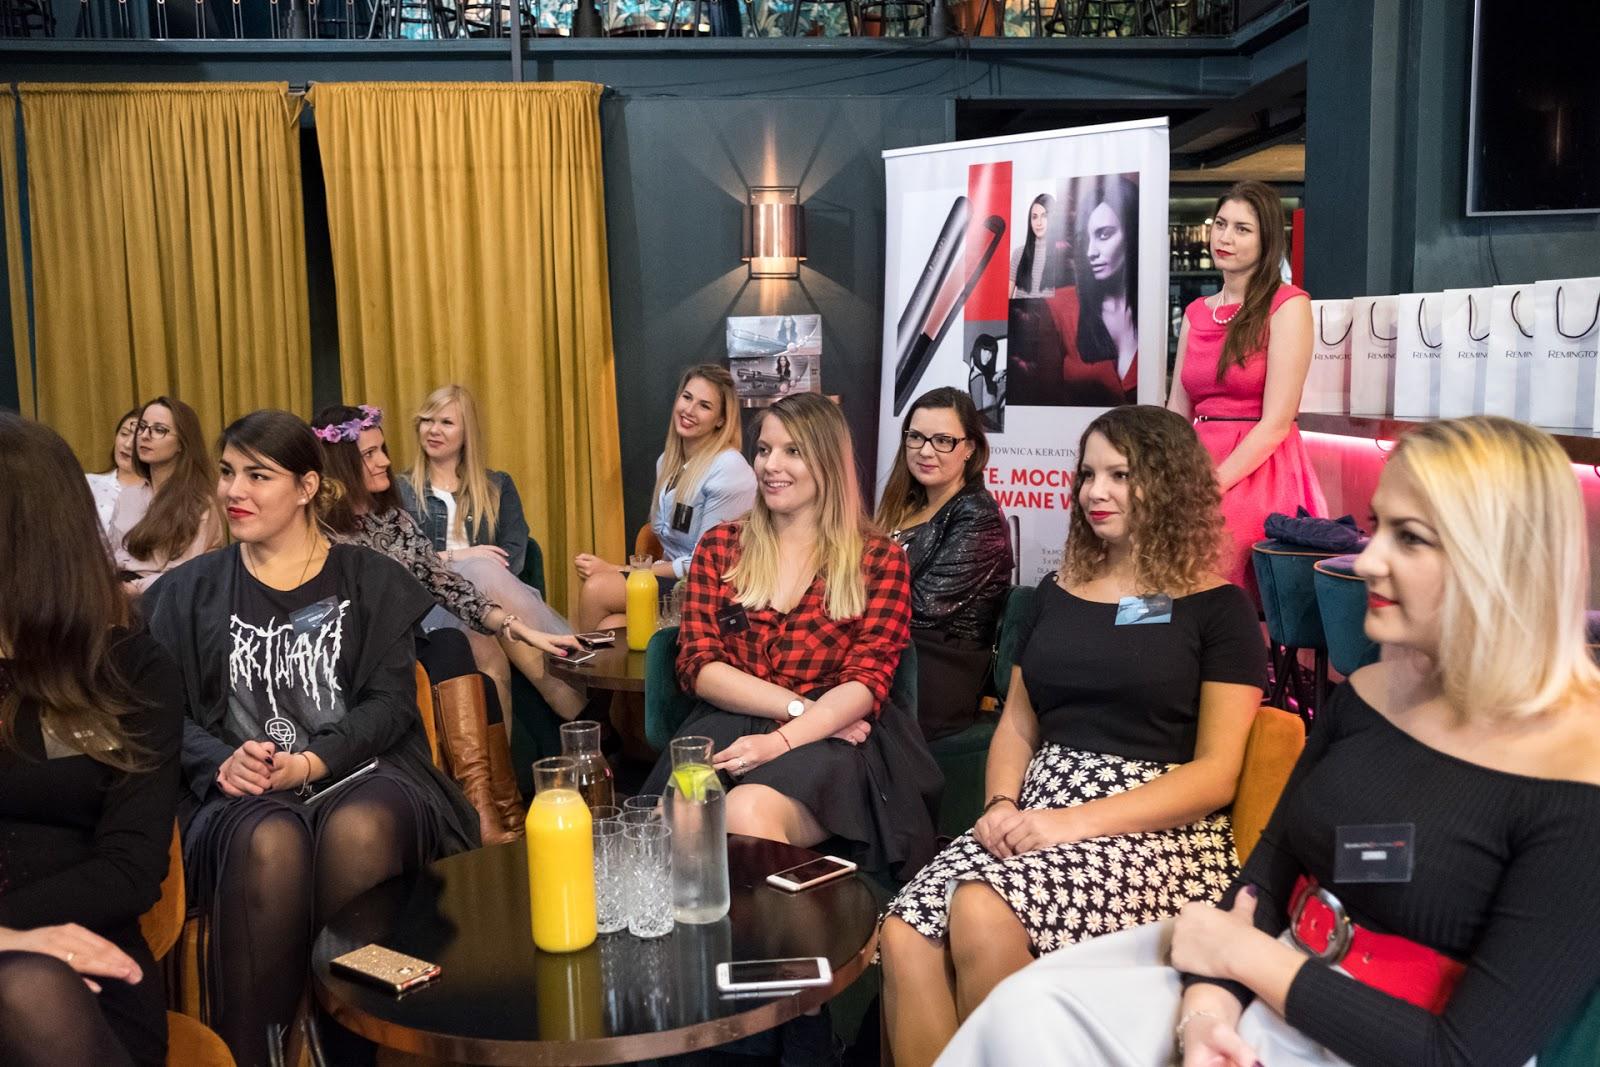 remington ritual party spotkanie blogerek produkty remington opinie jakość lokówka prostownica hair keratin protect klub ritual club coctail bar warszawa  salestube atelier agata szpejna opini